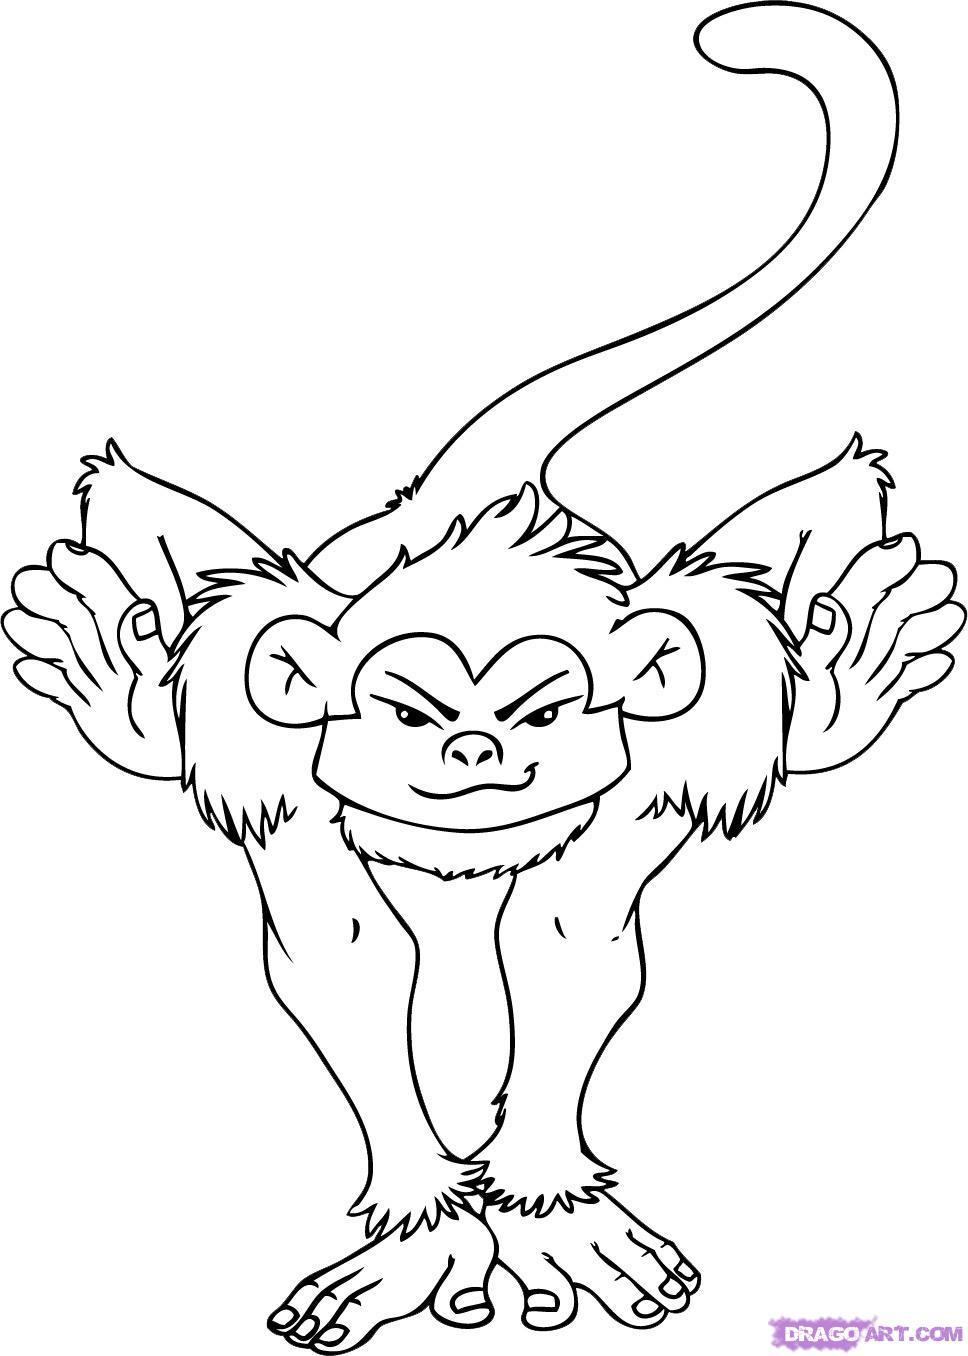 968x1356 Cartoon Monkey Drawing 6. How To Draw A Cartoon Monkey